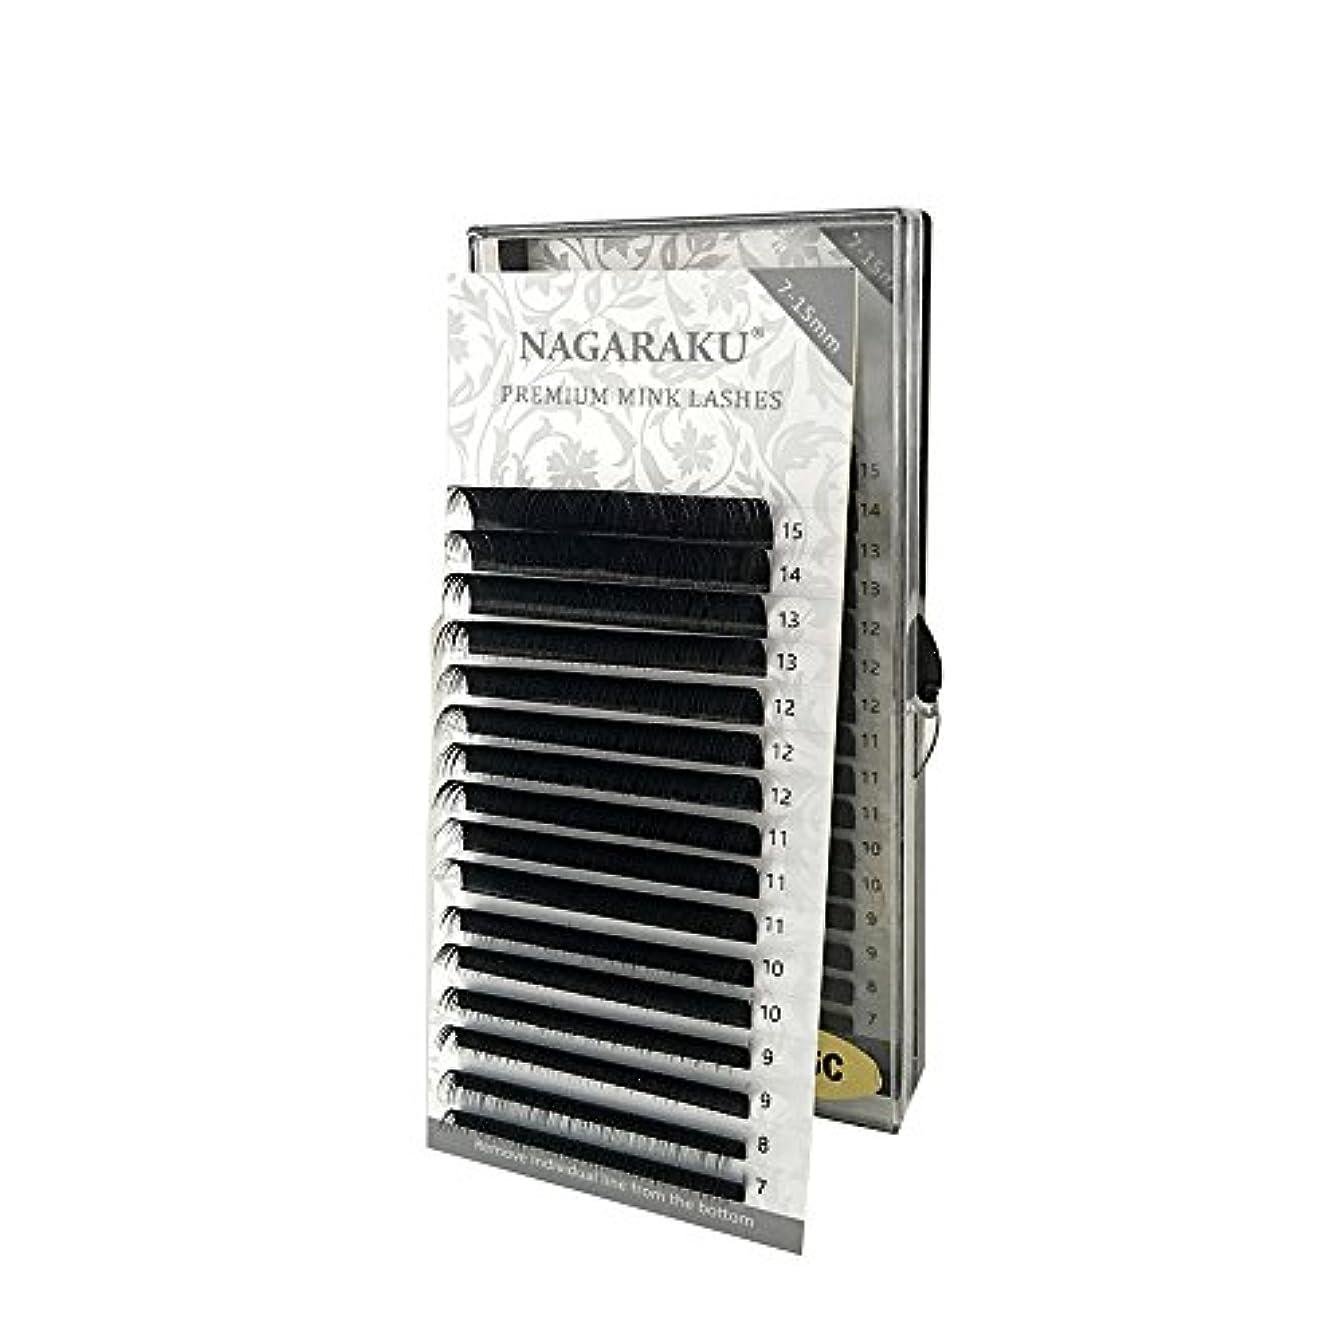 NAGARAKUまつげエクステ混合長さ極細ミックス高品質プレミアムMinkミンクMatteマット黒いつけまつげ アイラッシュ(0.25 C 7-15mm)